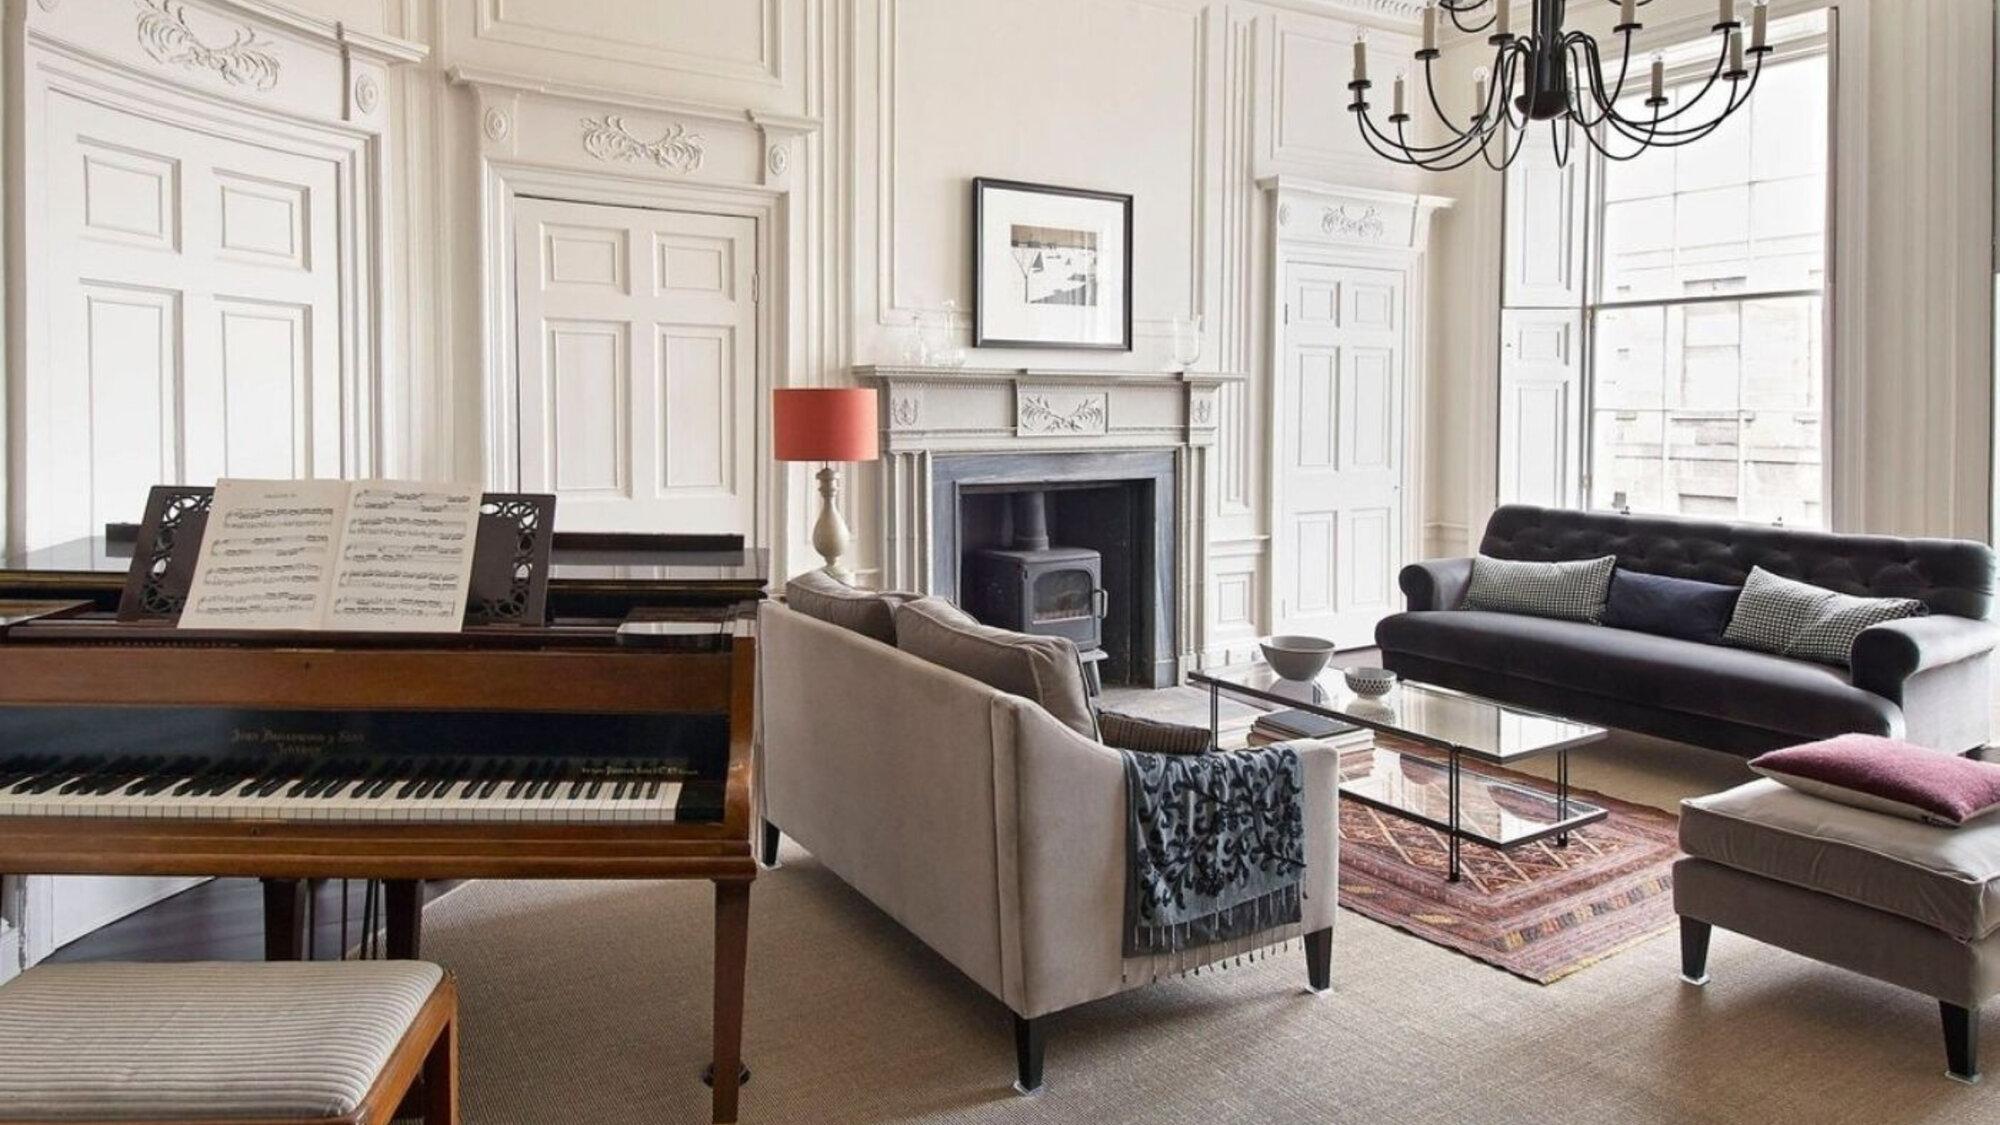 Edinburgh Accommodation Holiday let Scotland - Low res